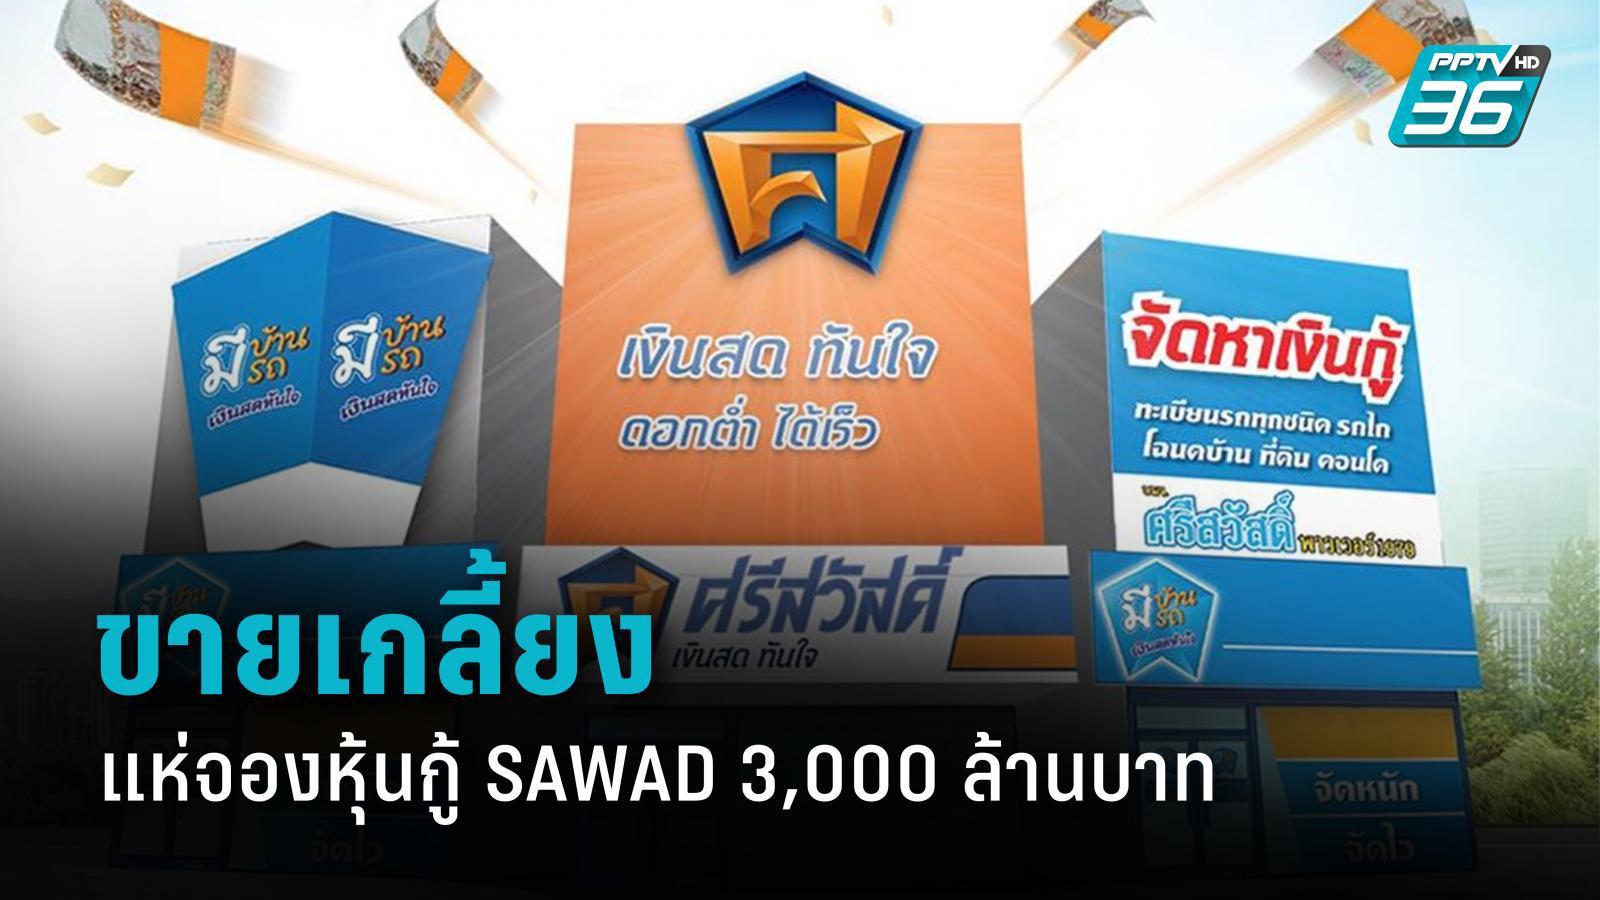 SAWAD ขายหุ้นกู้เกลี้ยง 3,000 ล้านบาท